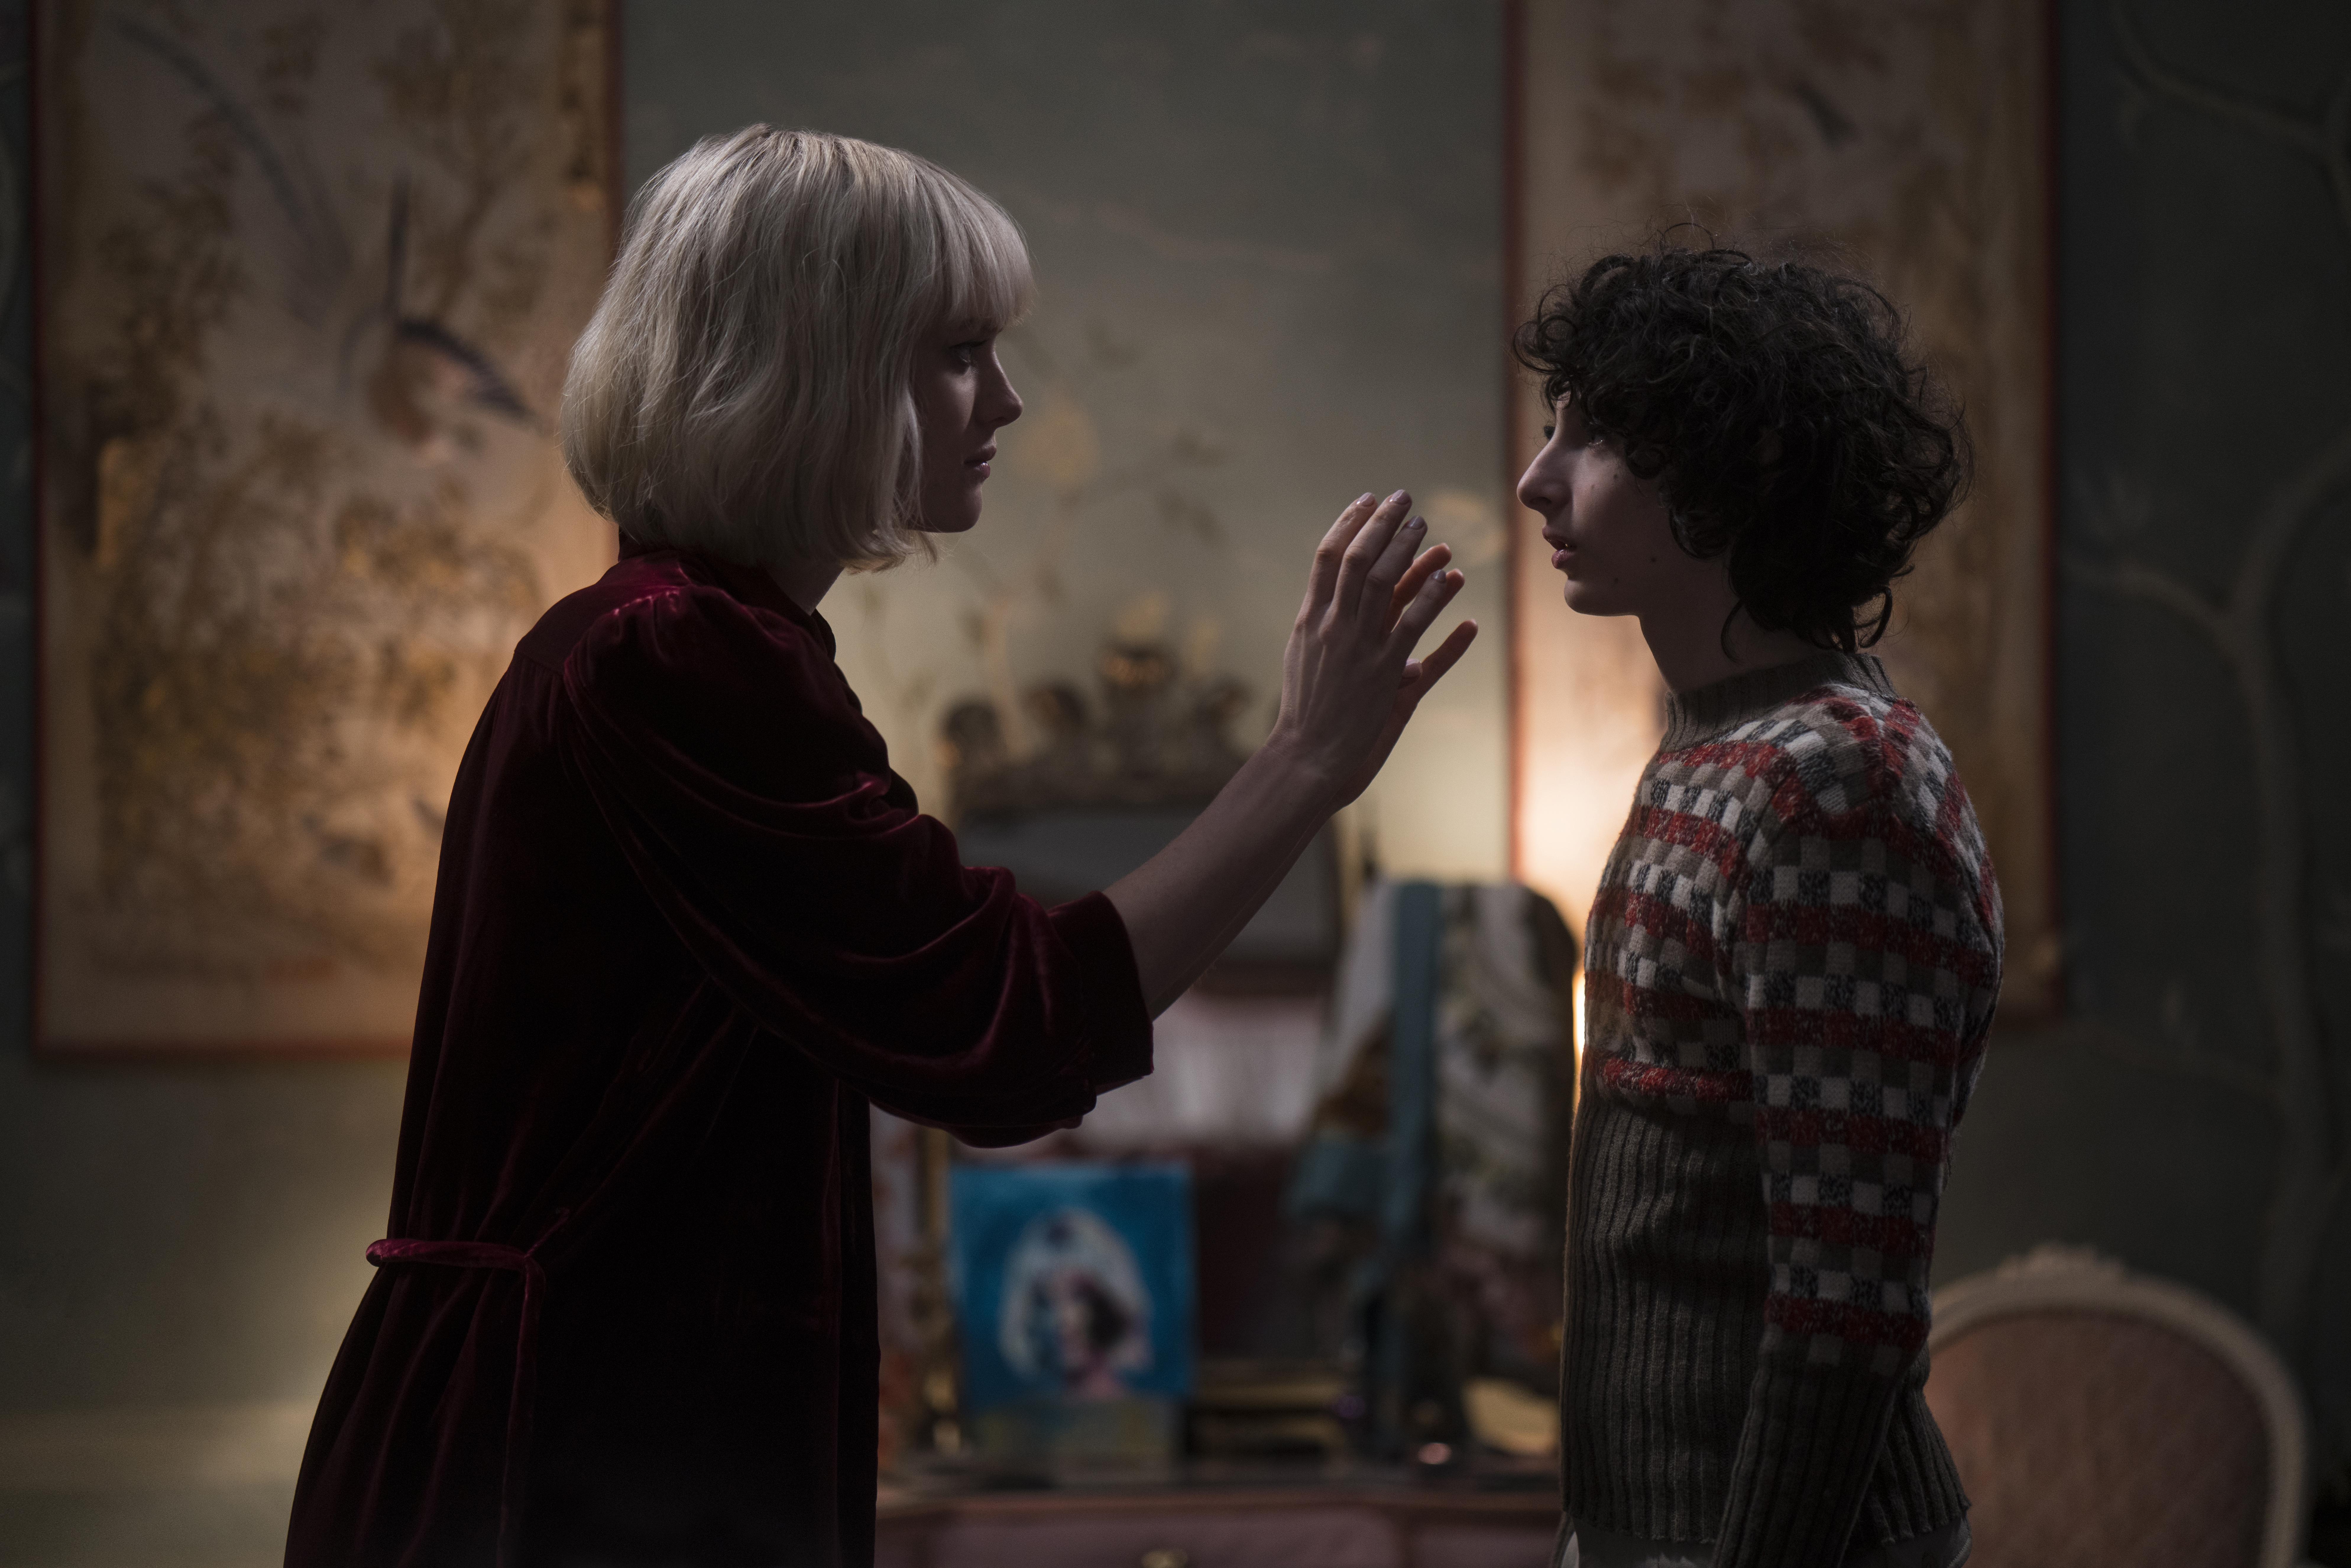 Mackenzie Davis and Finn Wolfhard in The Turning (2020)